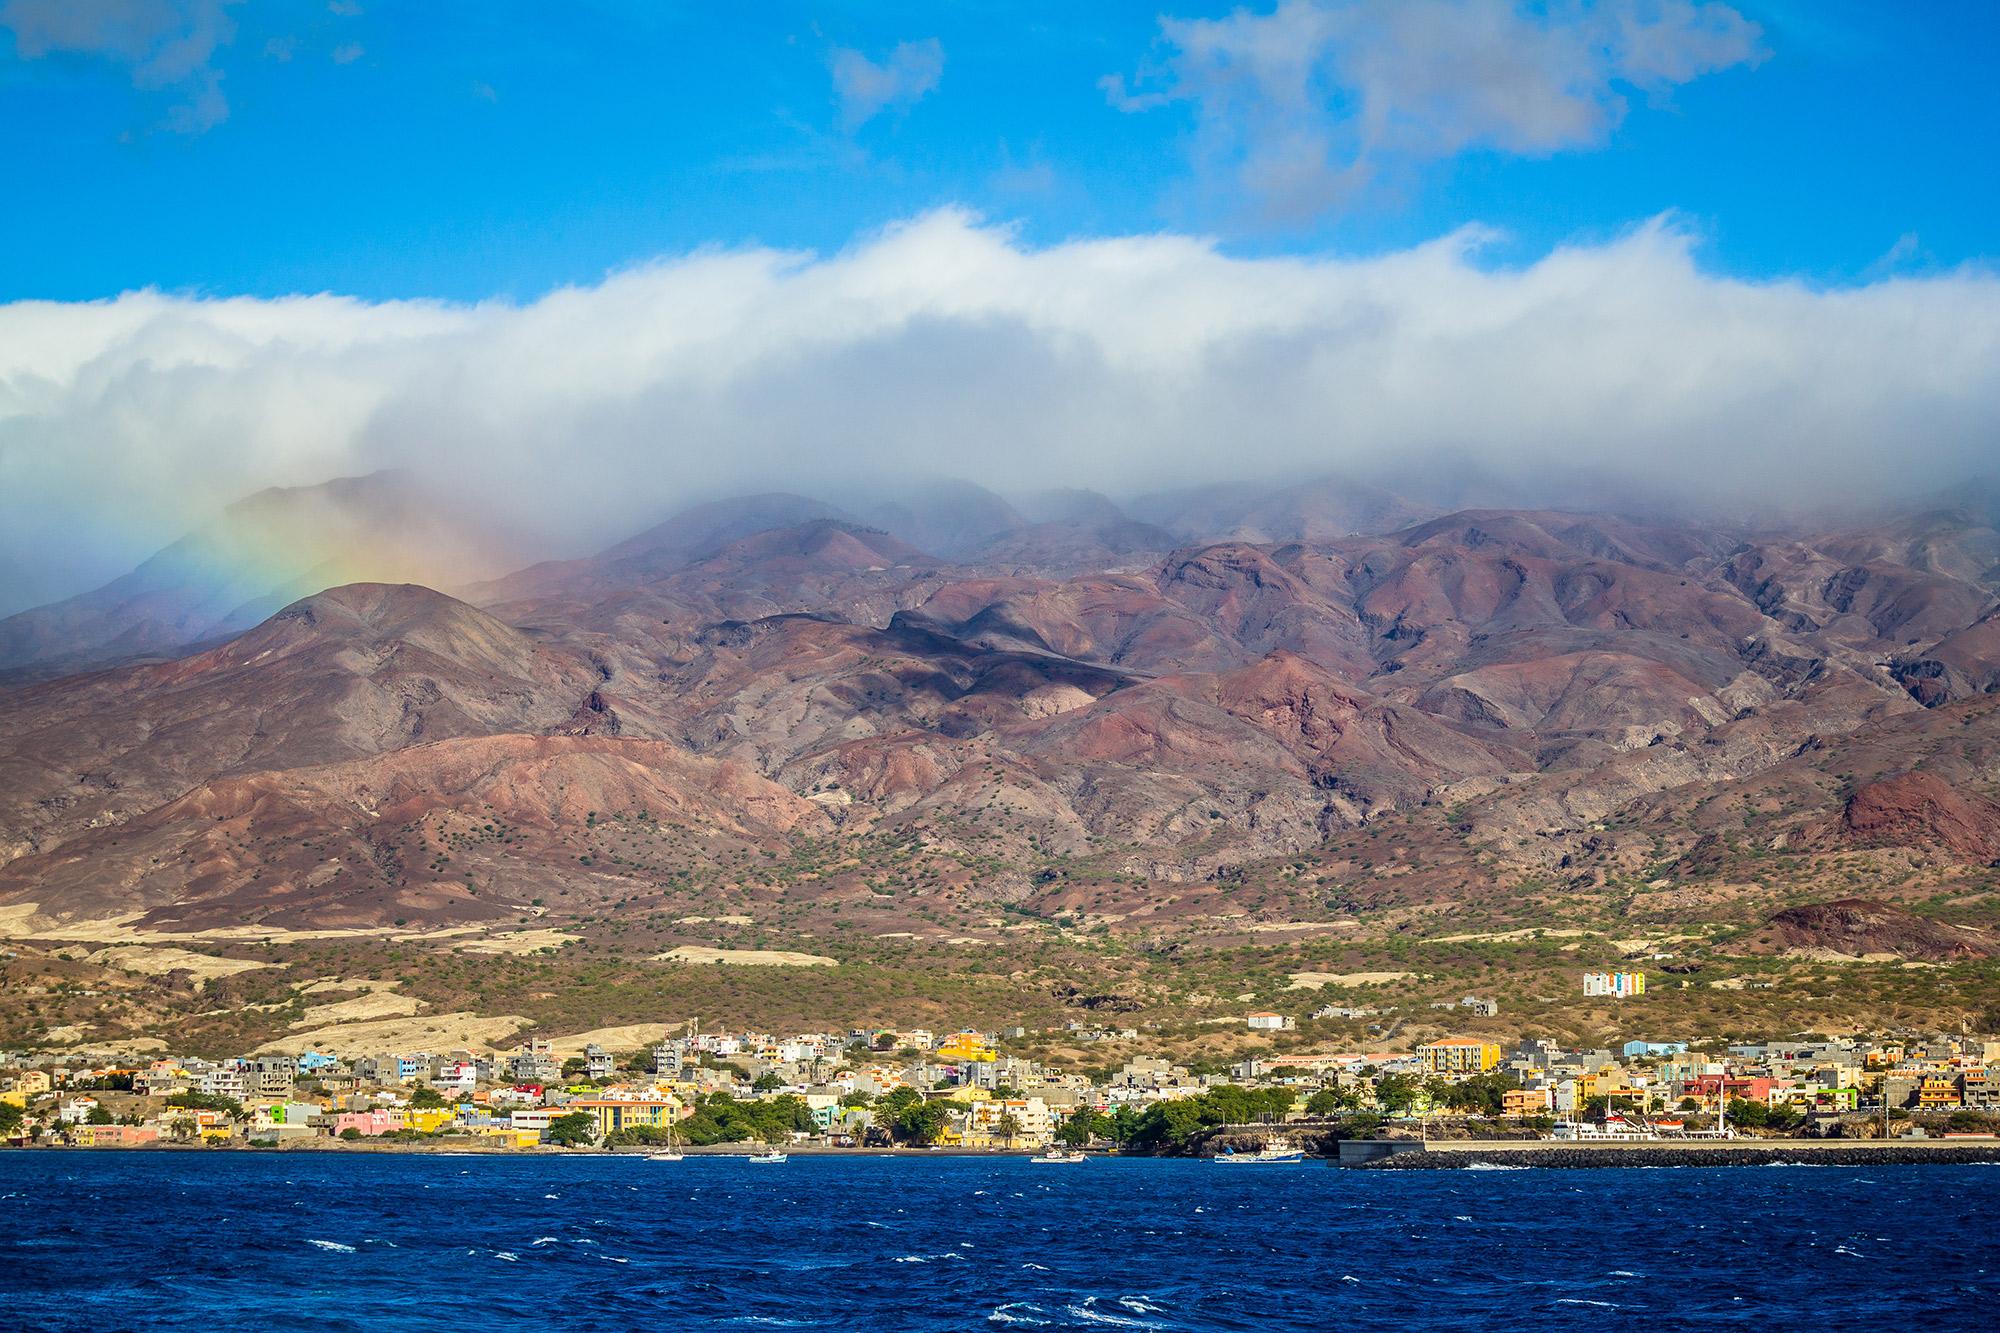 "Cabo Verde, Santo Antão, von Susana Martins / < a href=""https://www.shutterstock.com/de/image-photo/cape-verde-santo-1321980485?src=CtCnlDYHxxO3MOGzotTtiQ-7-98&studio=1"">shutterstock.com"